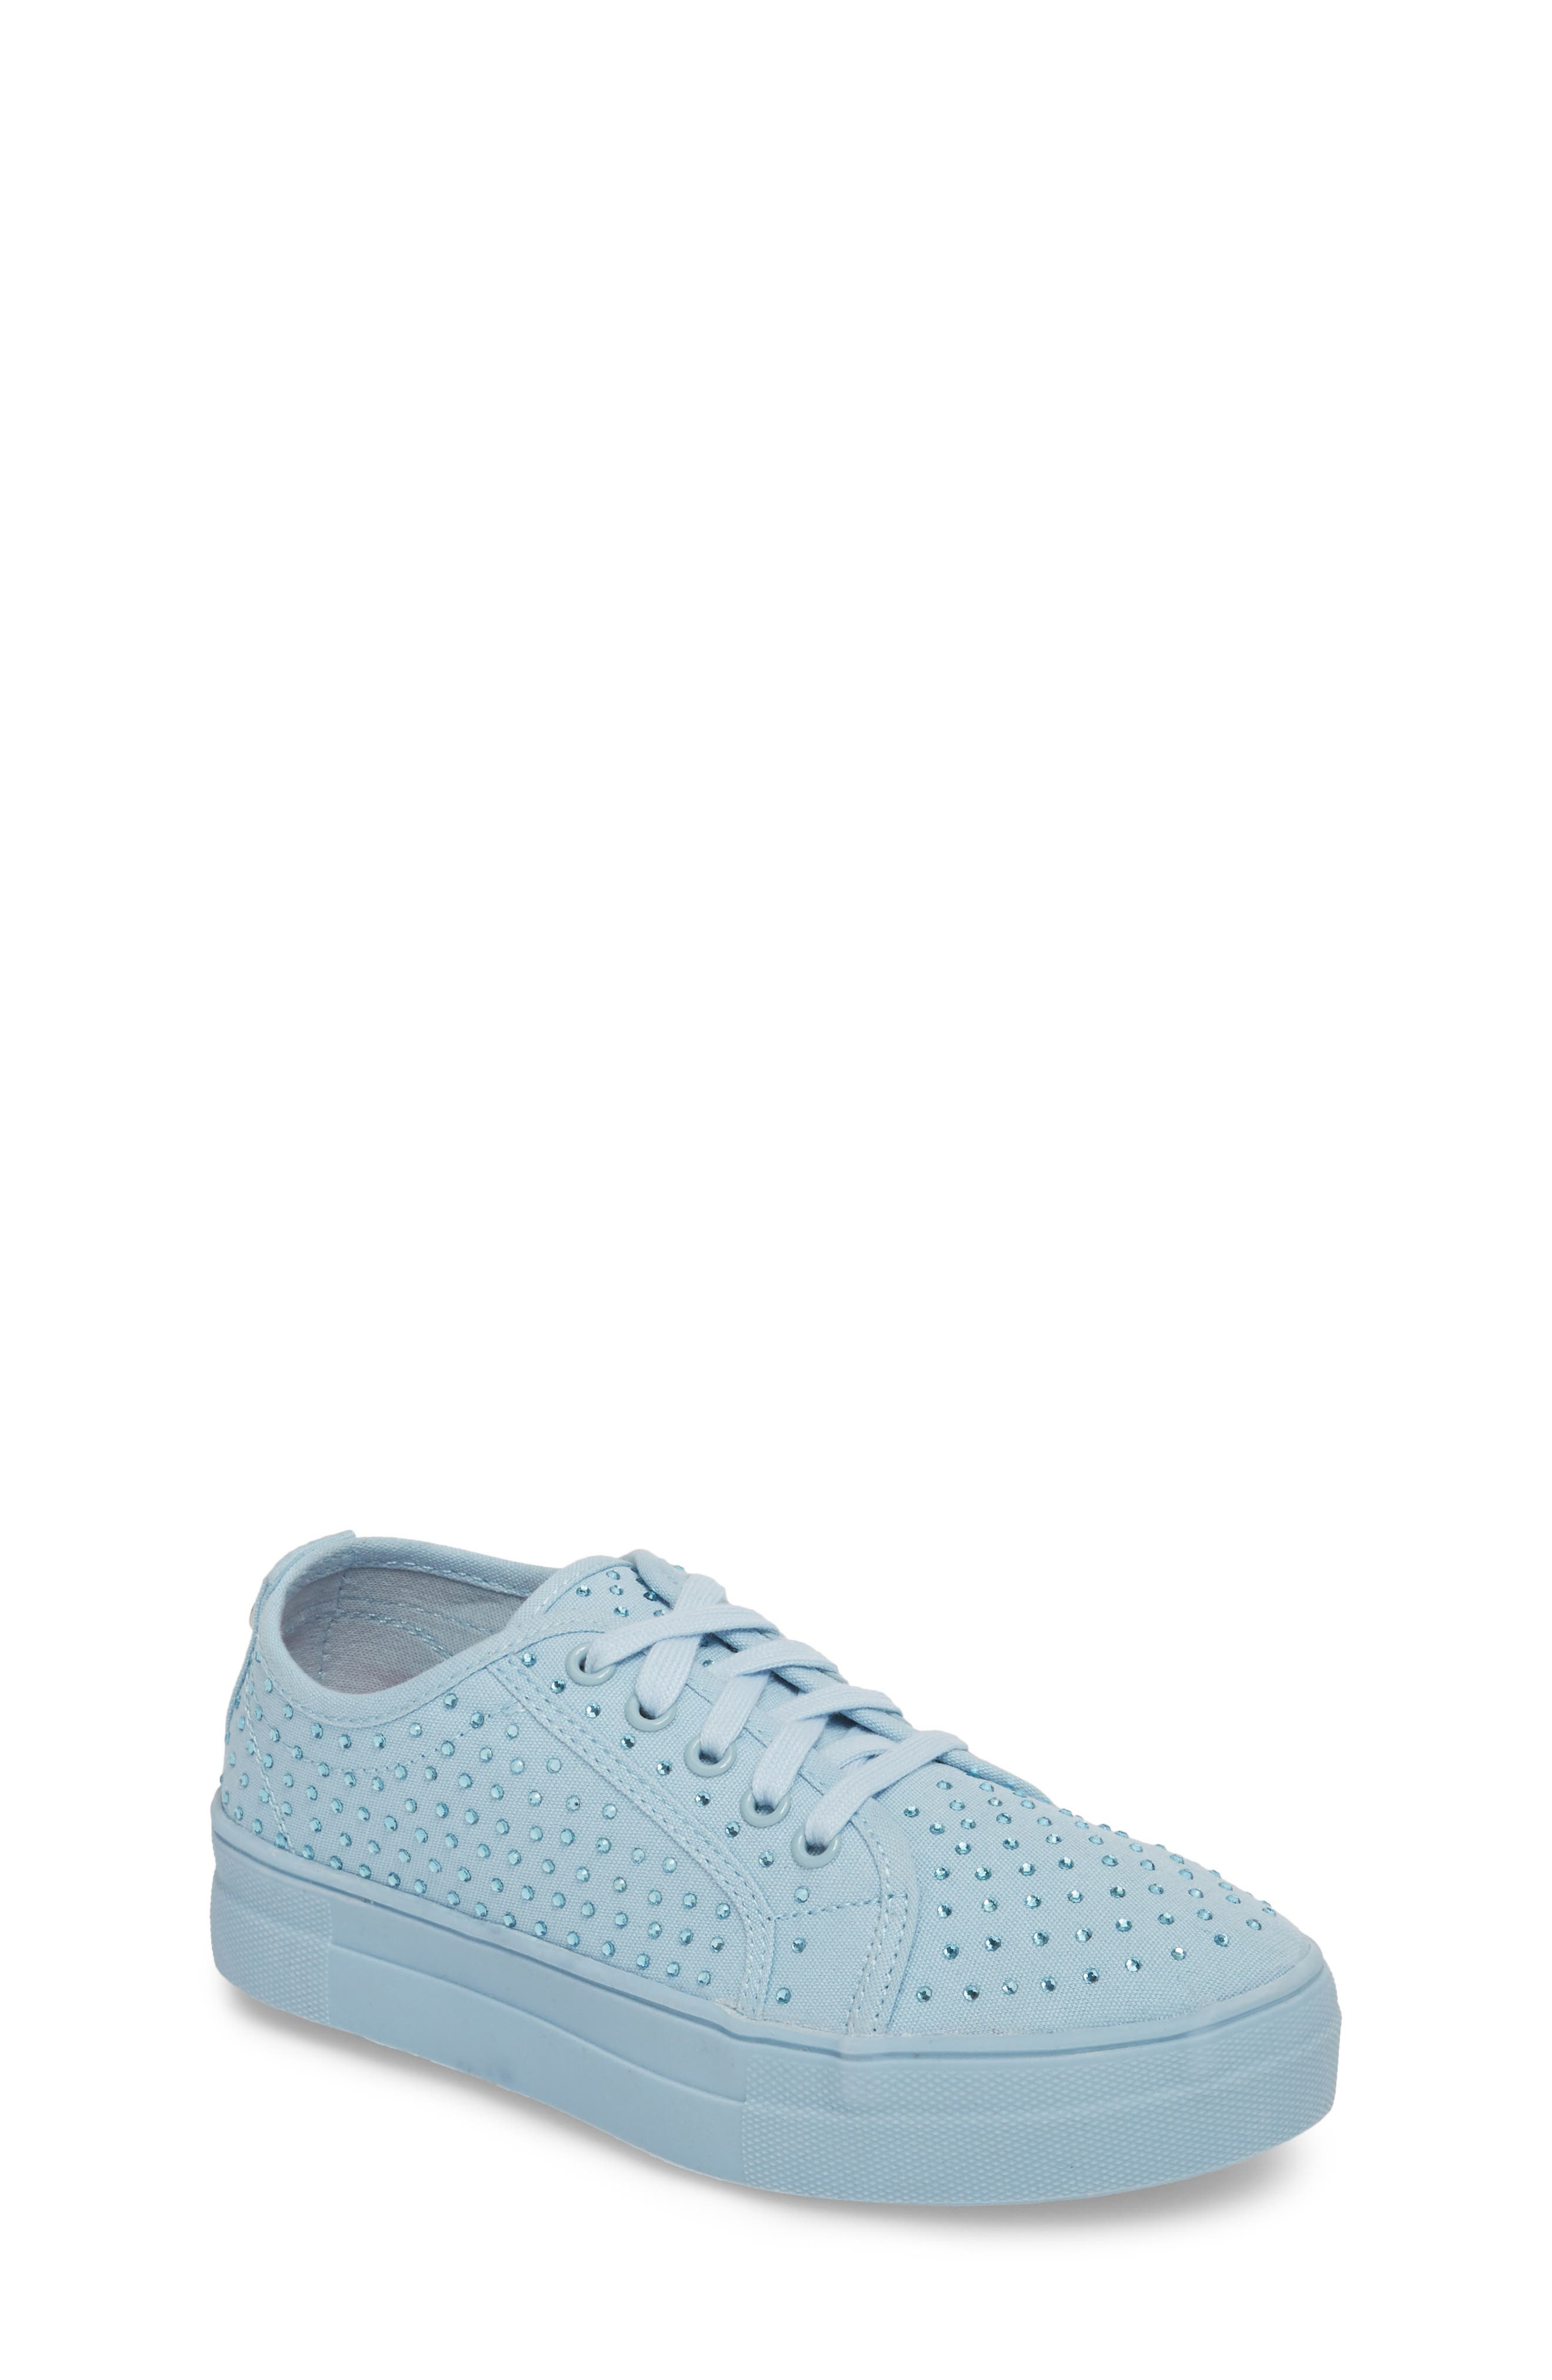 Jmono Sneaker,                         Main,                         color, Blue